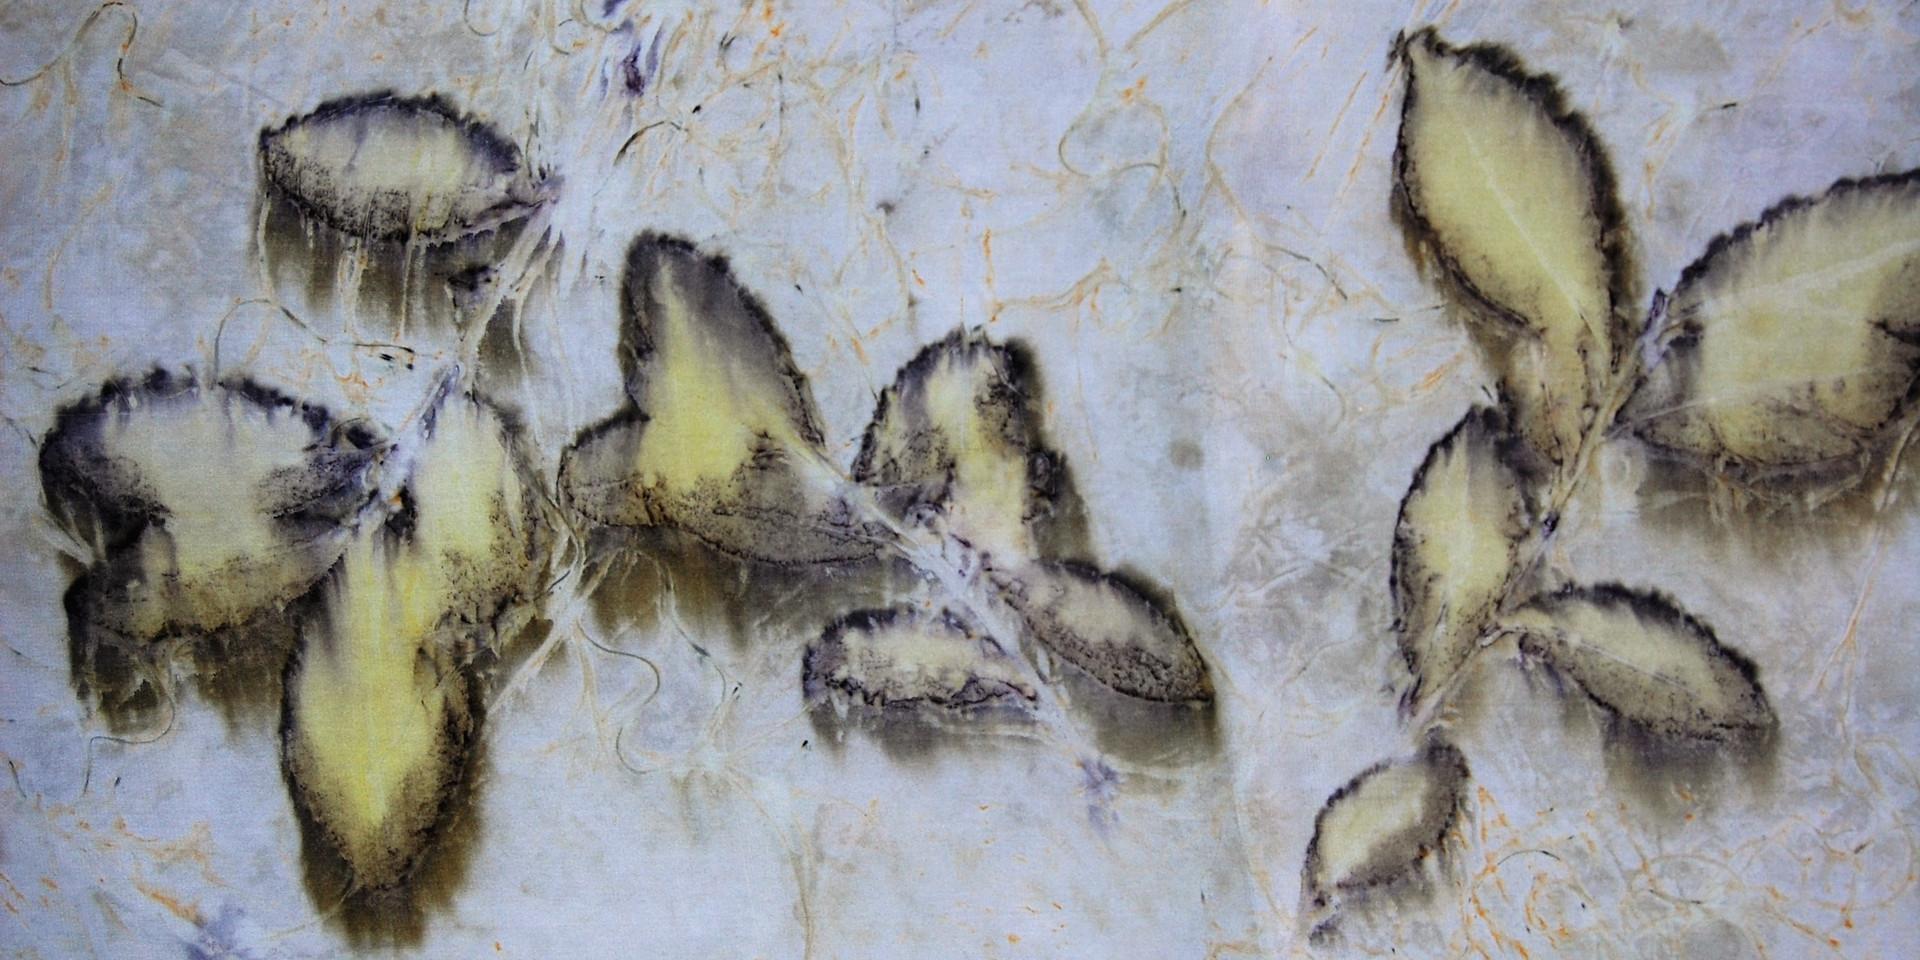 Detail - Tea Leaves